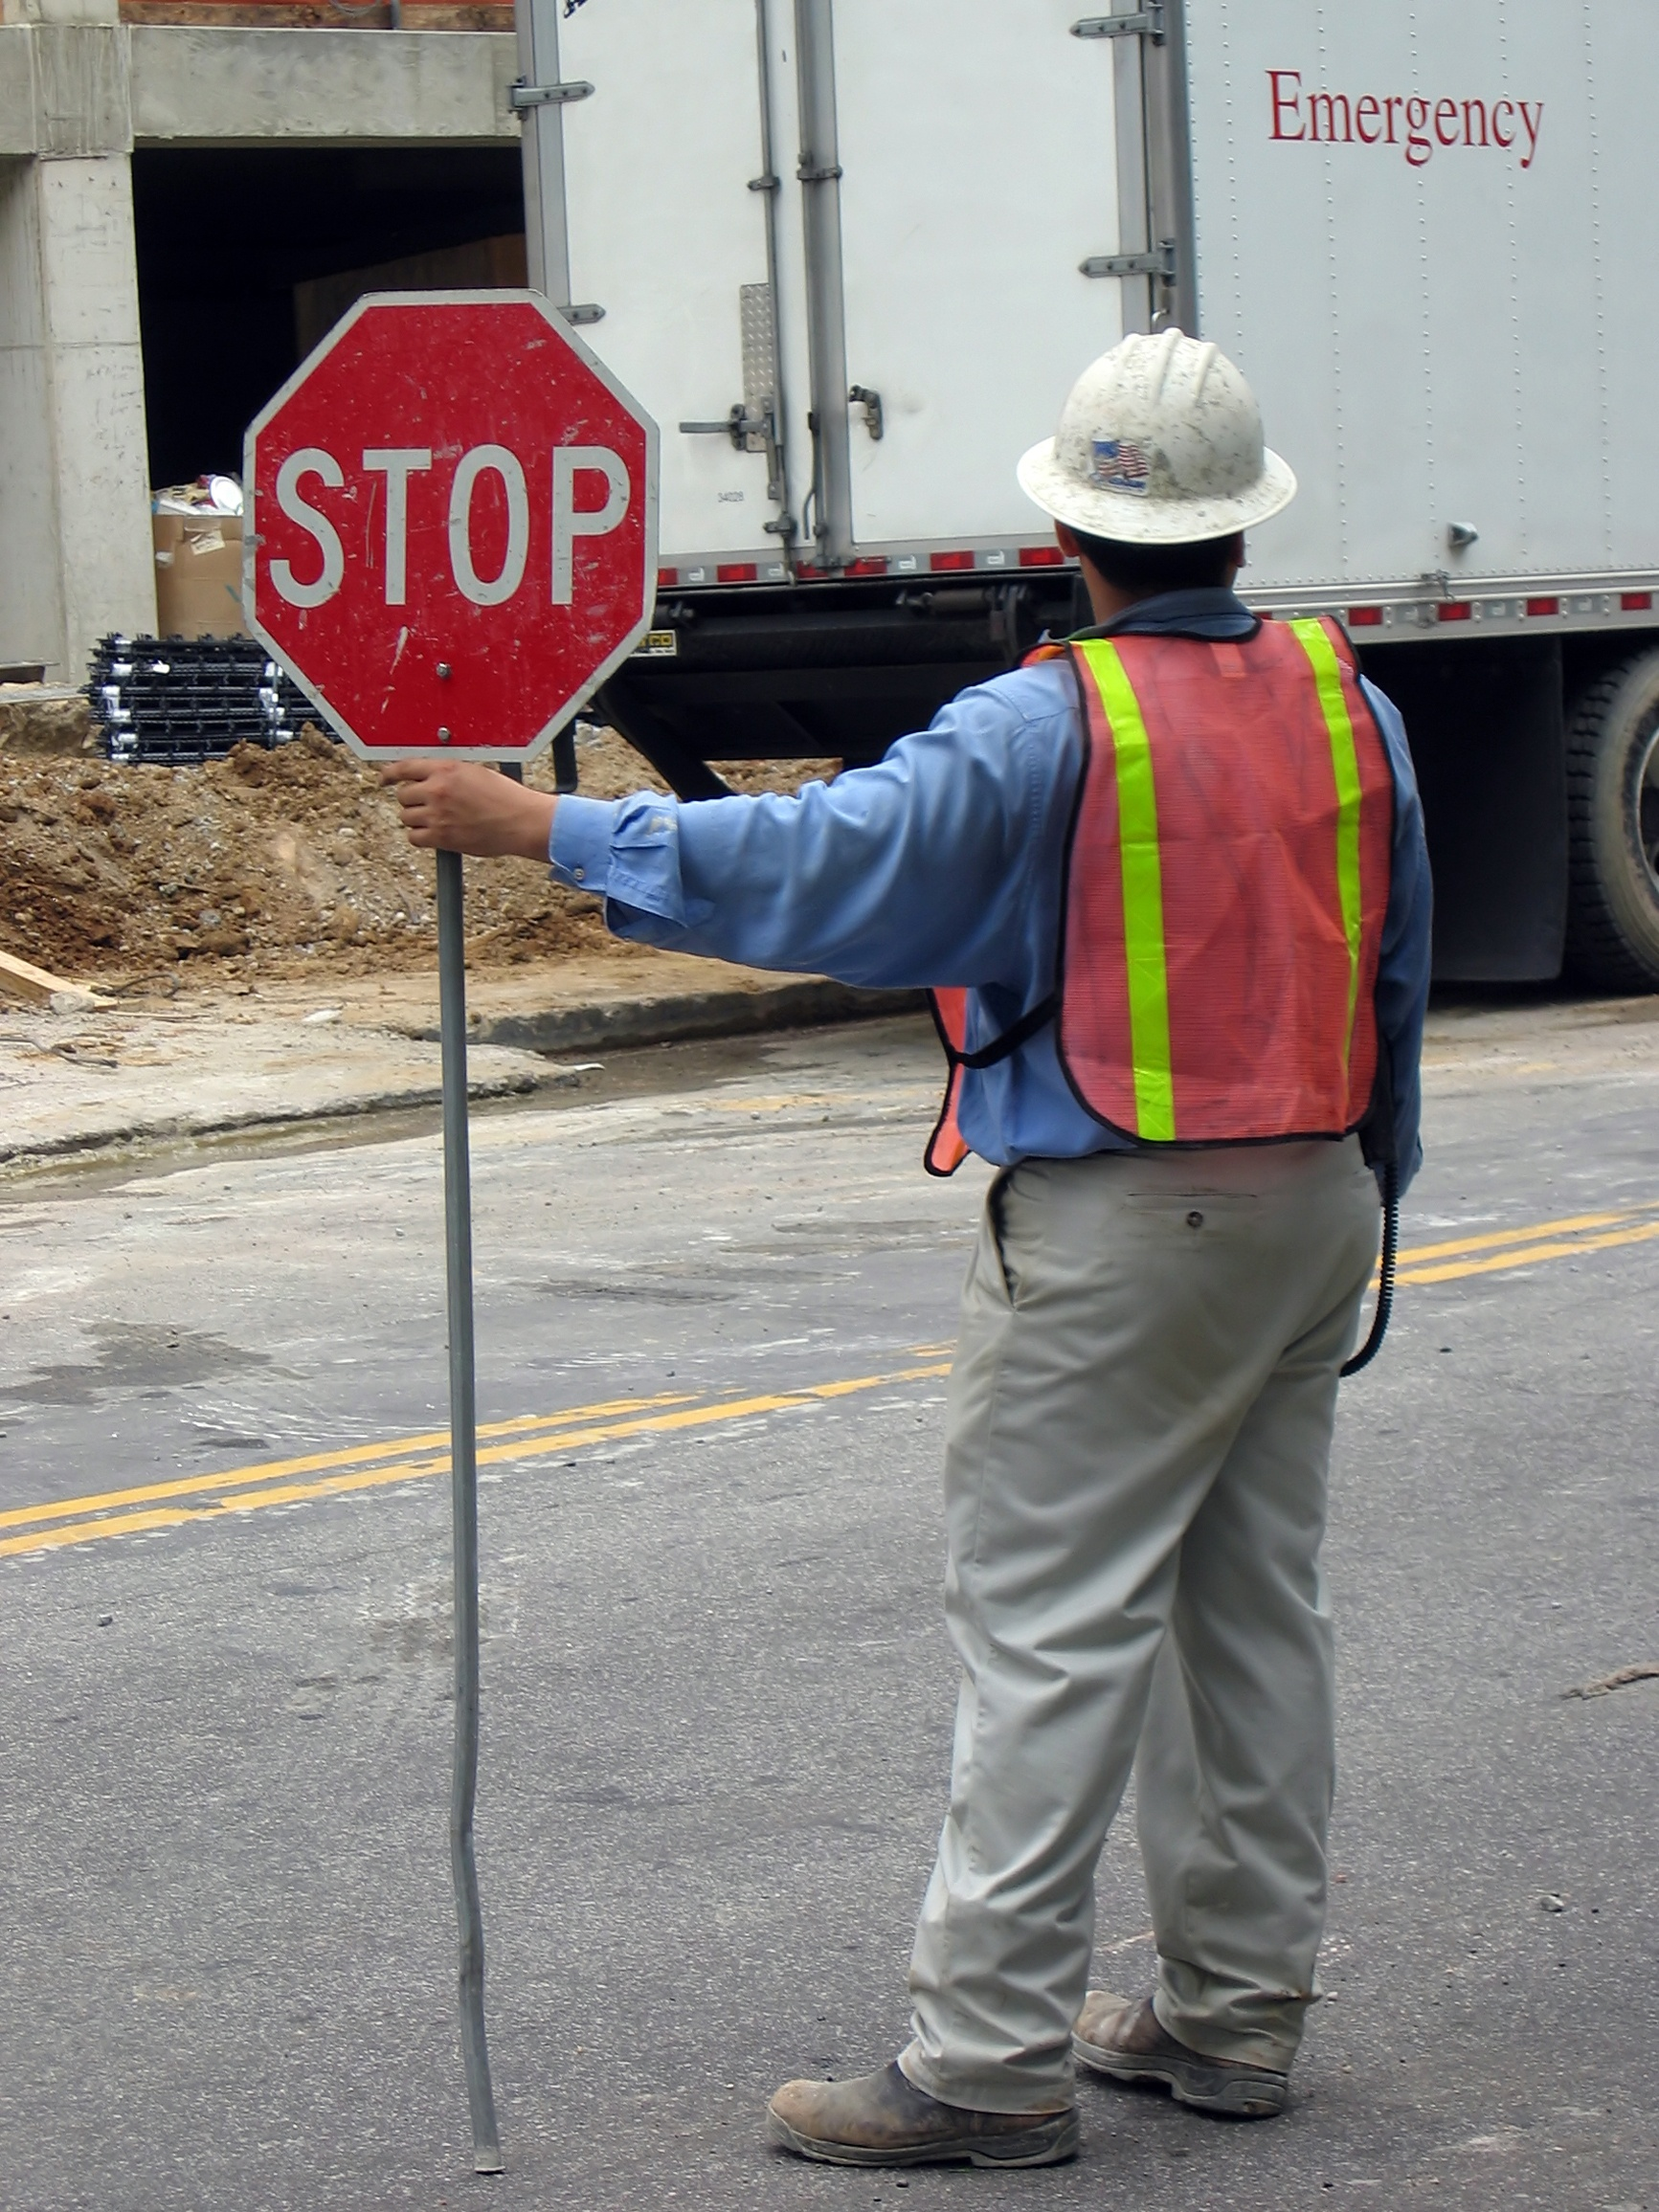 Fleet_Safety_-_Construction_Zone